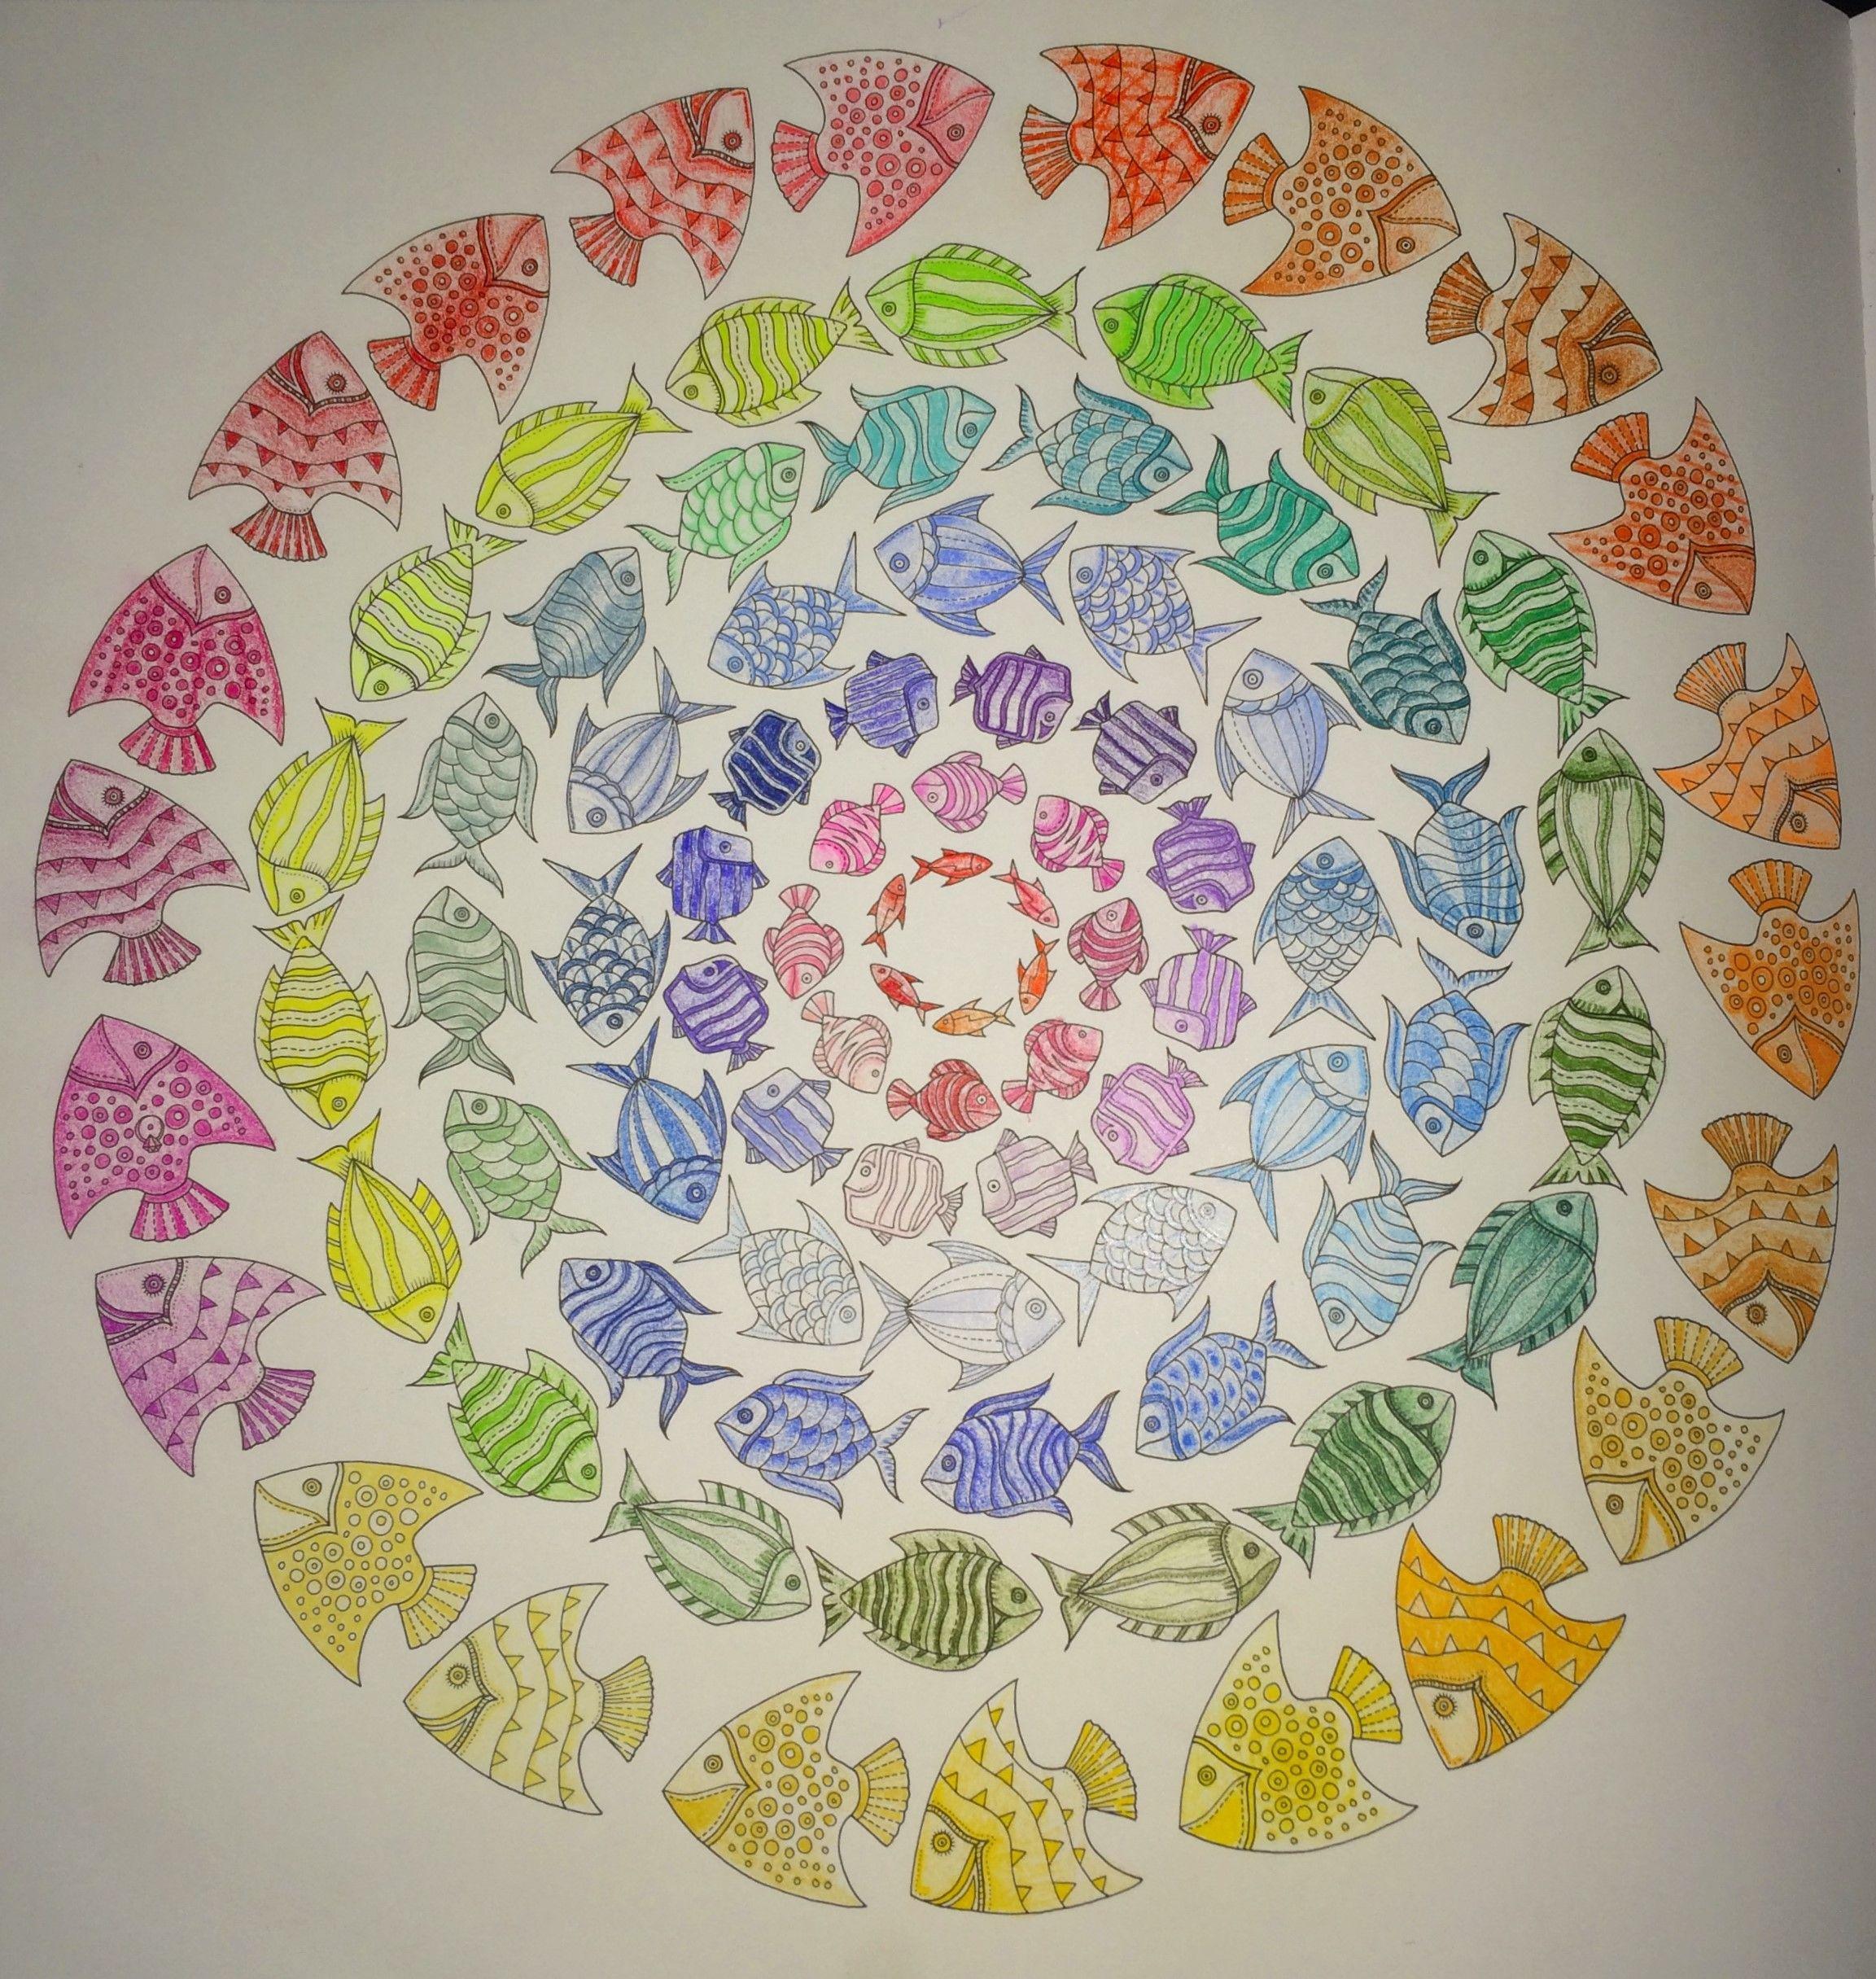 Fish Rainbow Johanna Basford S Lost Ocean Johanna Basford Coloring Book Johanna Basford Lost Ocean Coloring Books